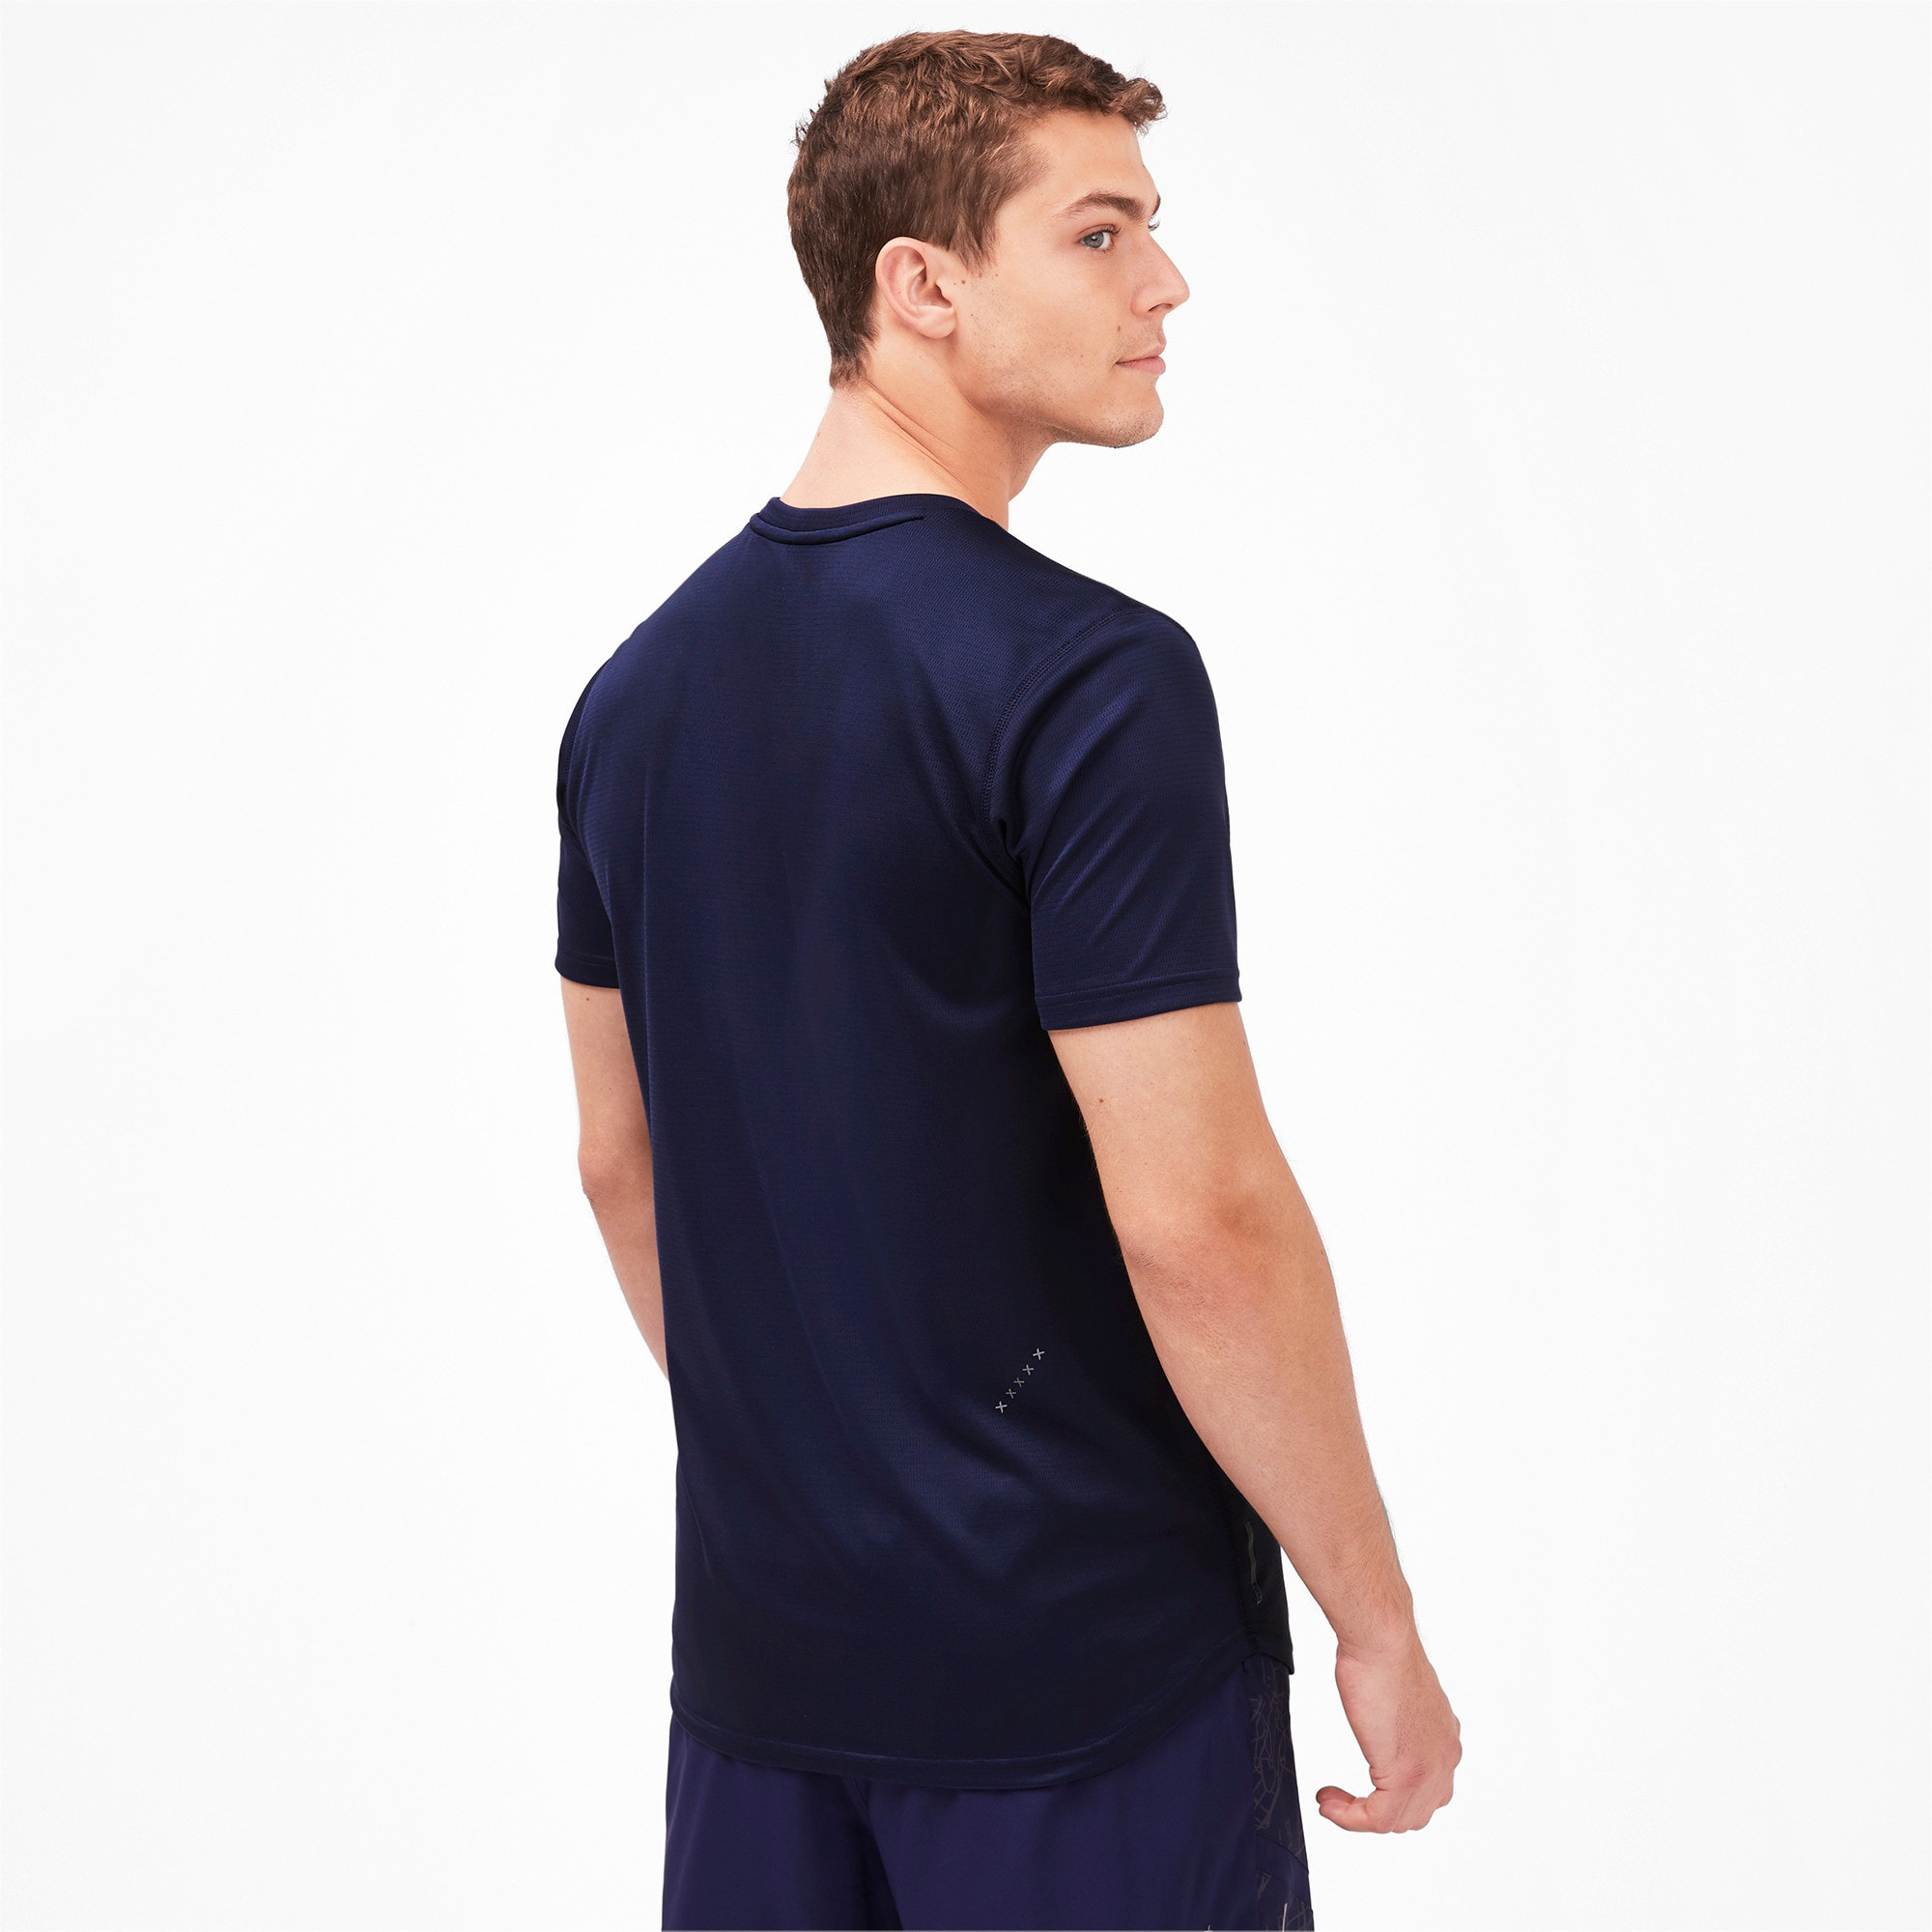 Thumbnail 2 of IGNITE Men's Running T-Shirt, Peacoat, medium